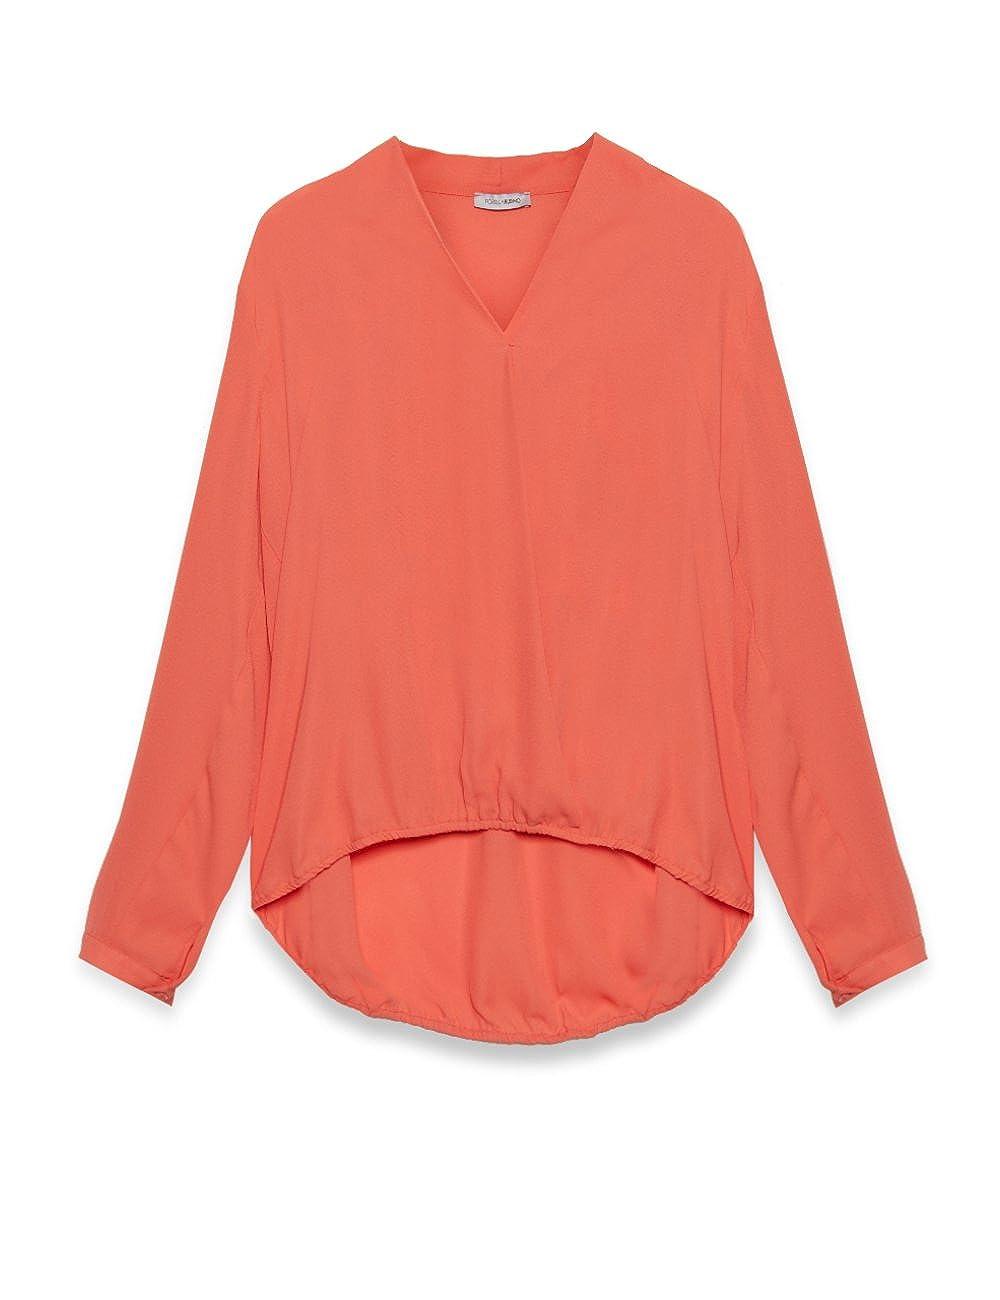 Fiorella Rubino: Blusa de mujer con manga larga de tejido vaporoso ligero . Plus size. Naranja sol, tamaño 49: Amazon.es: Ropa y accesorios